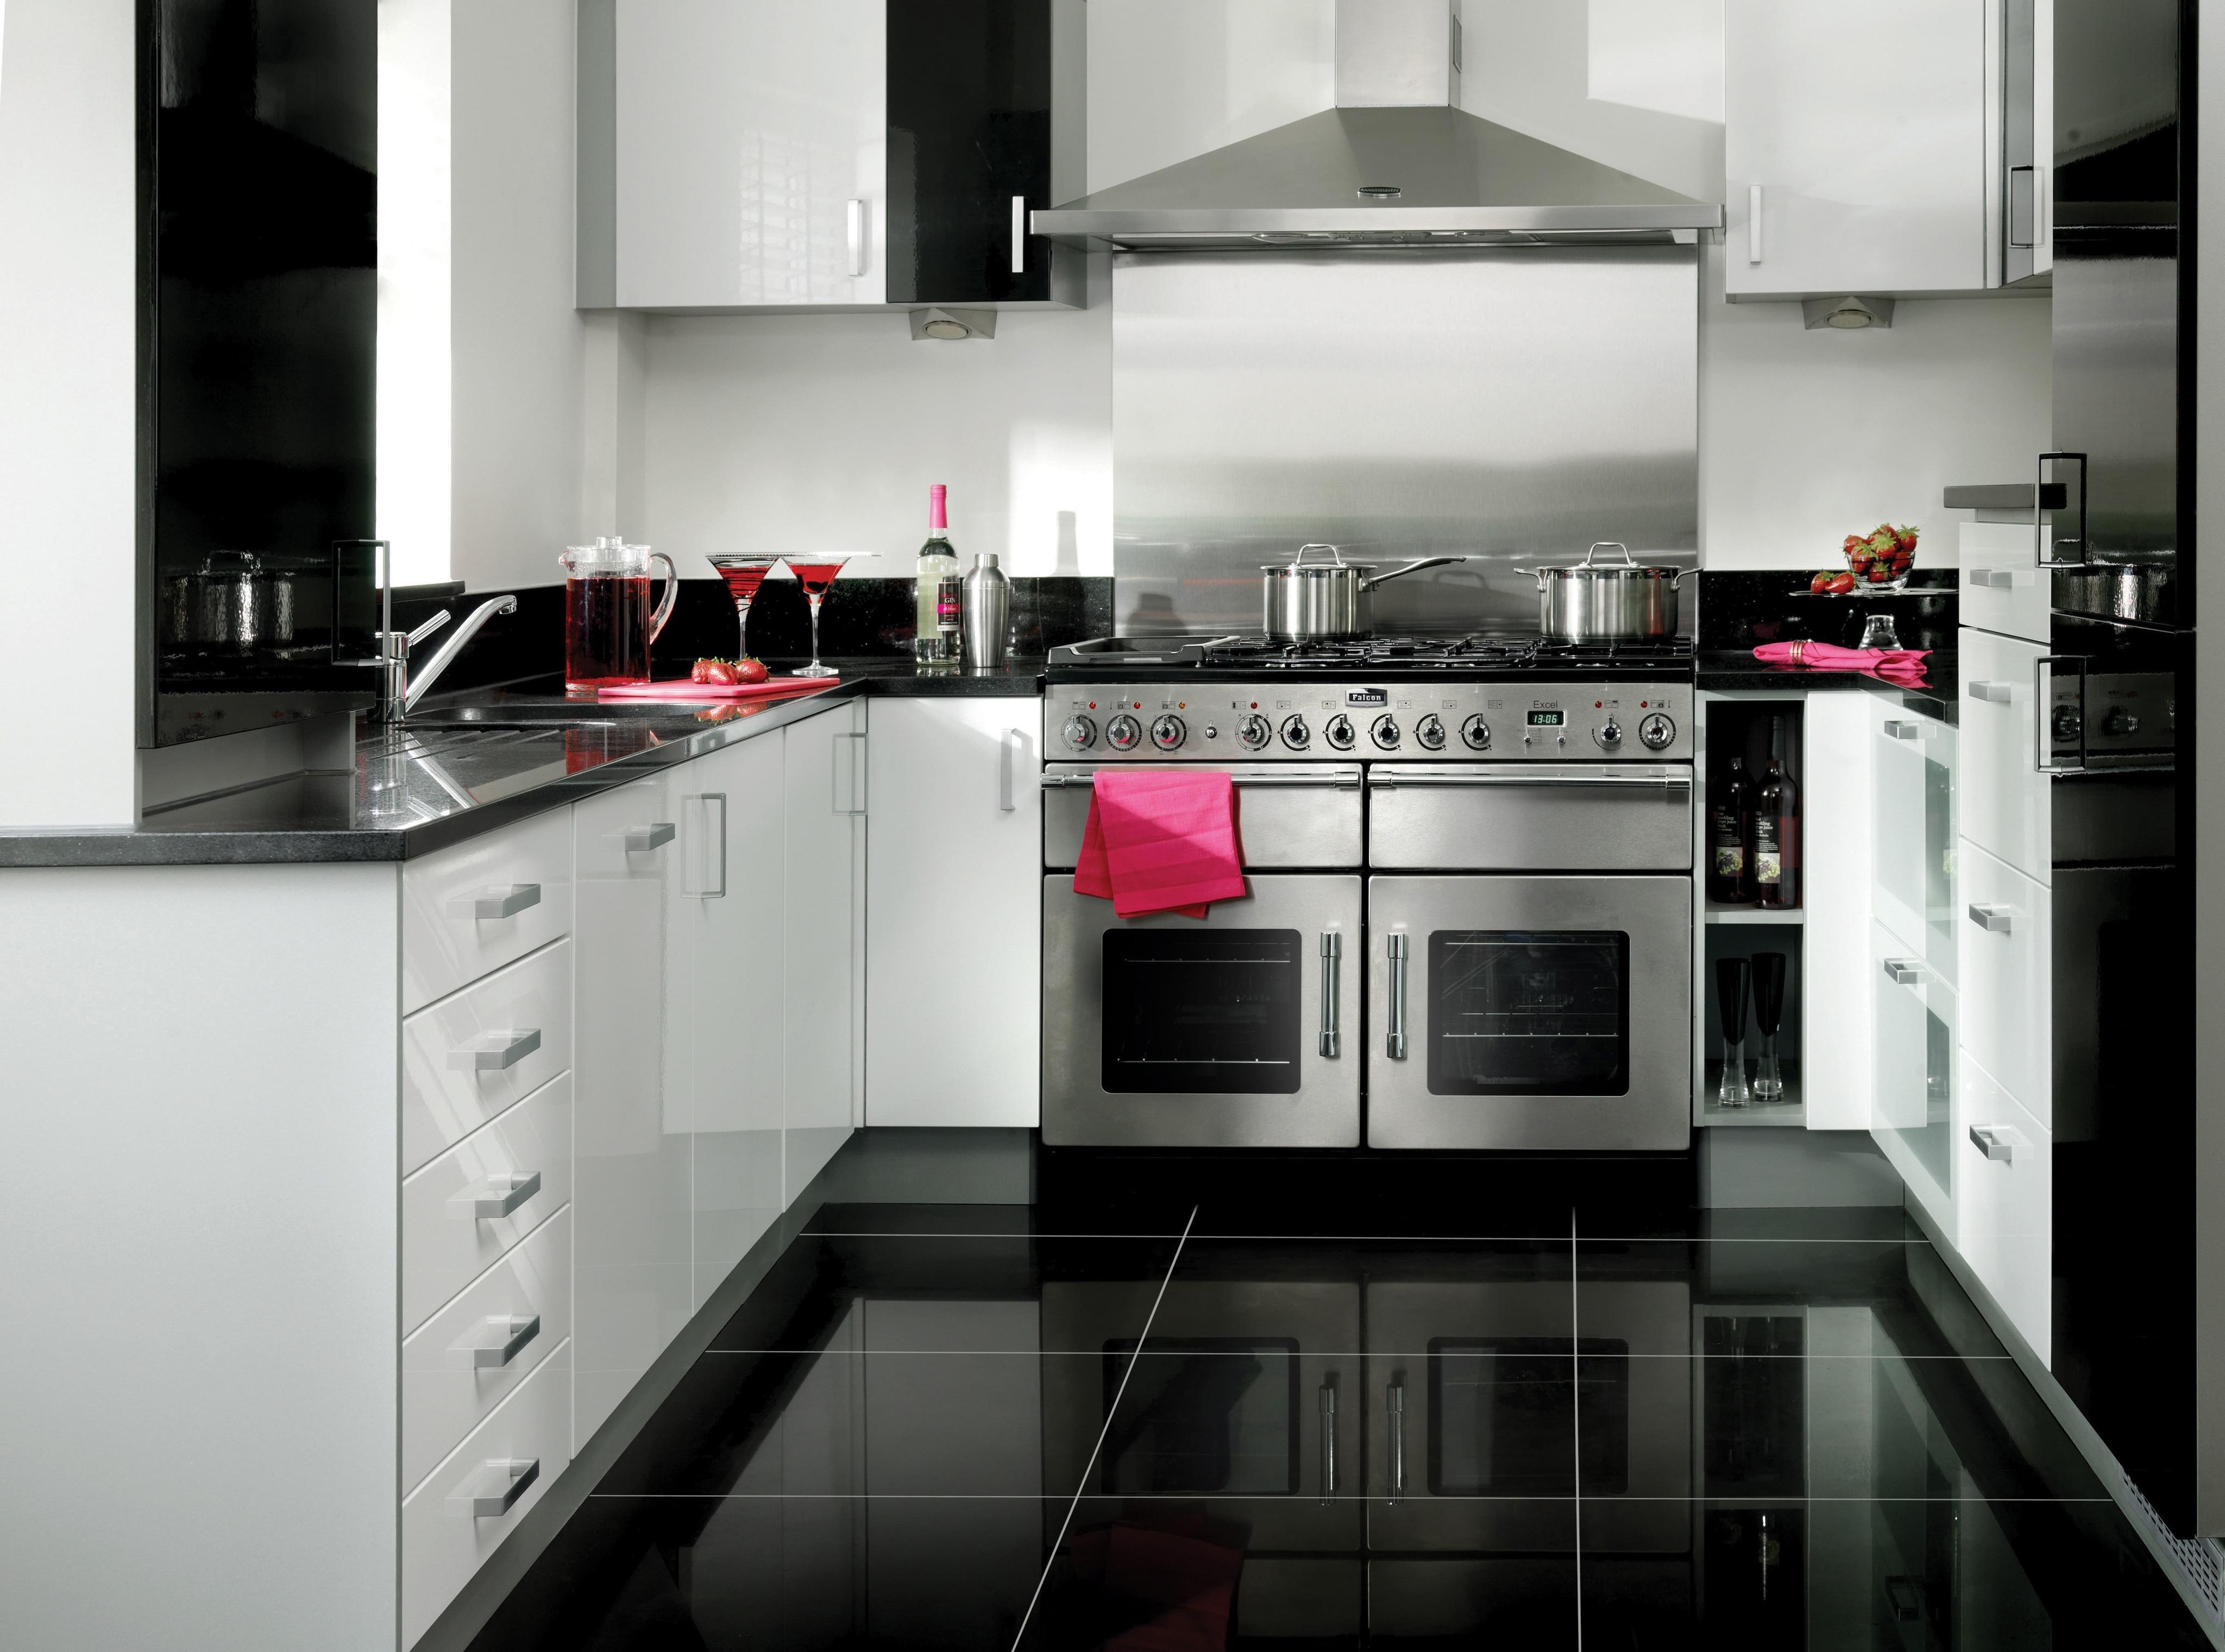 Graue kuche o bilder ideen o couchstyle for Falcon küche